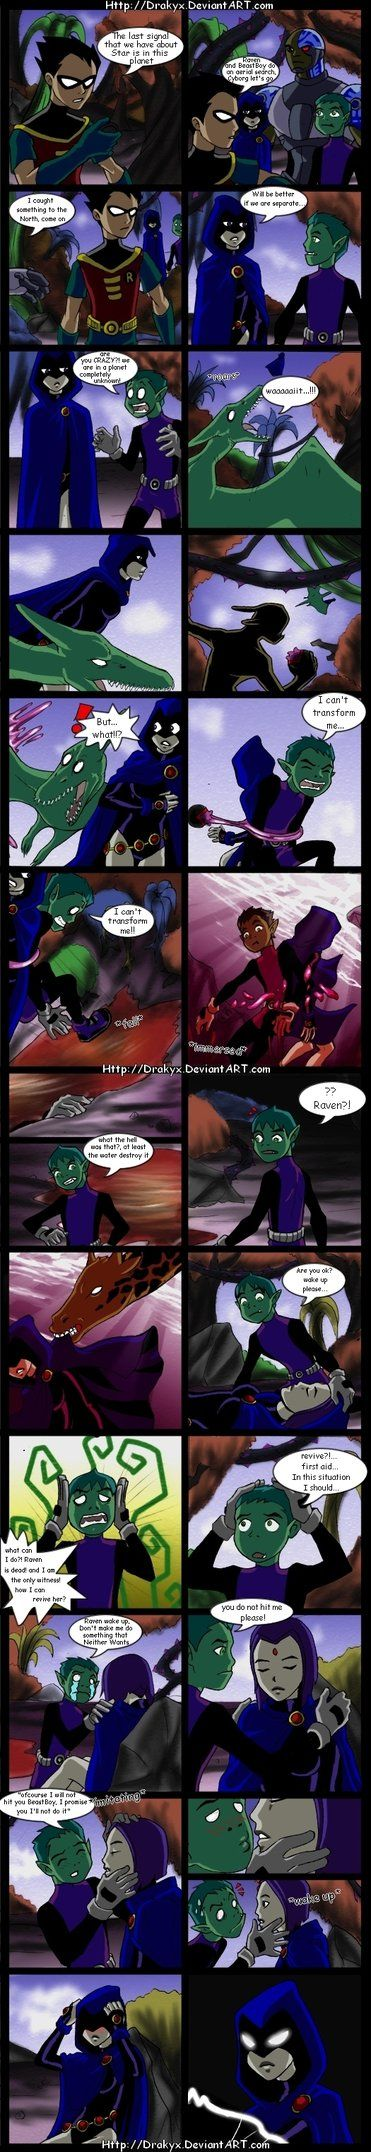 196 Best Dc Comics - Teen Titans Images On Pinterest  Cartoon Art, Comic Art And Comics-5478